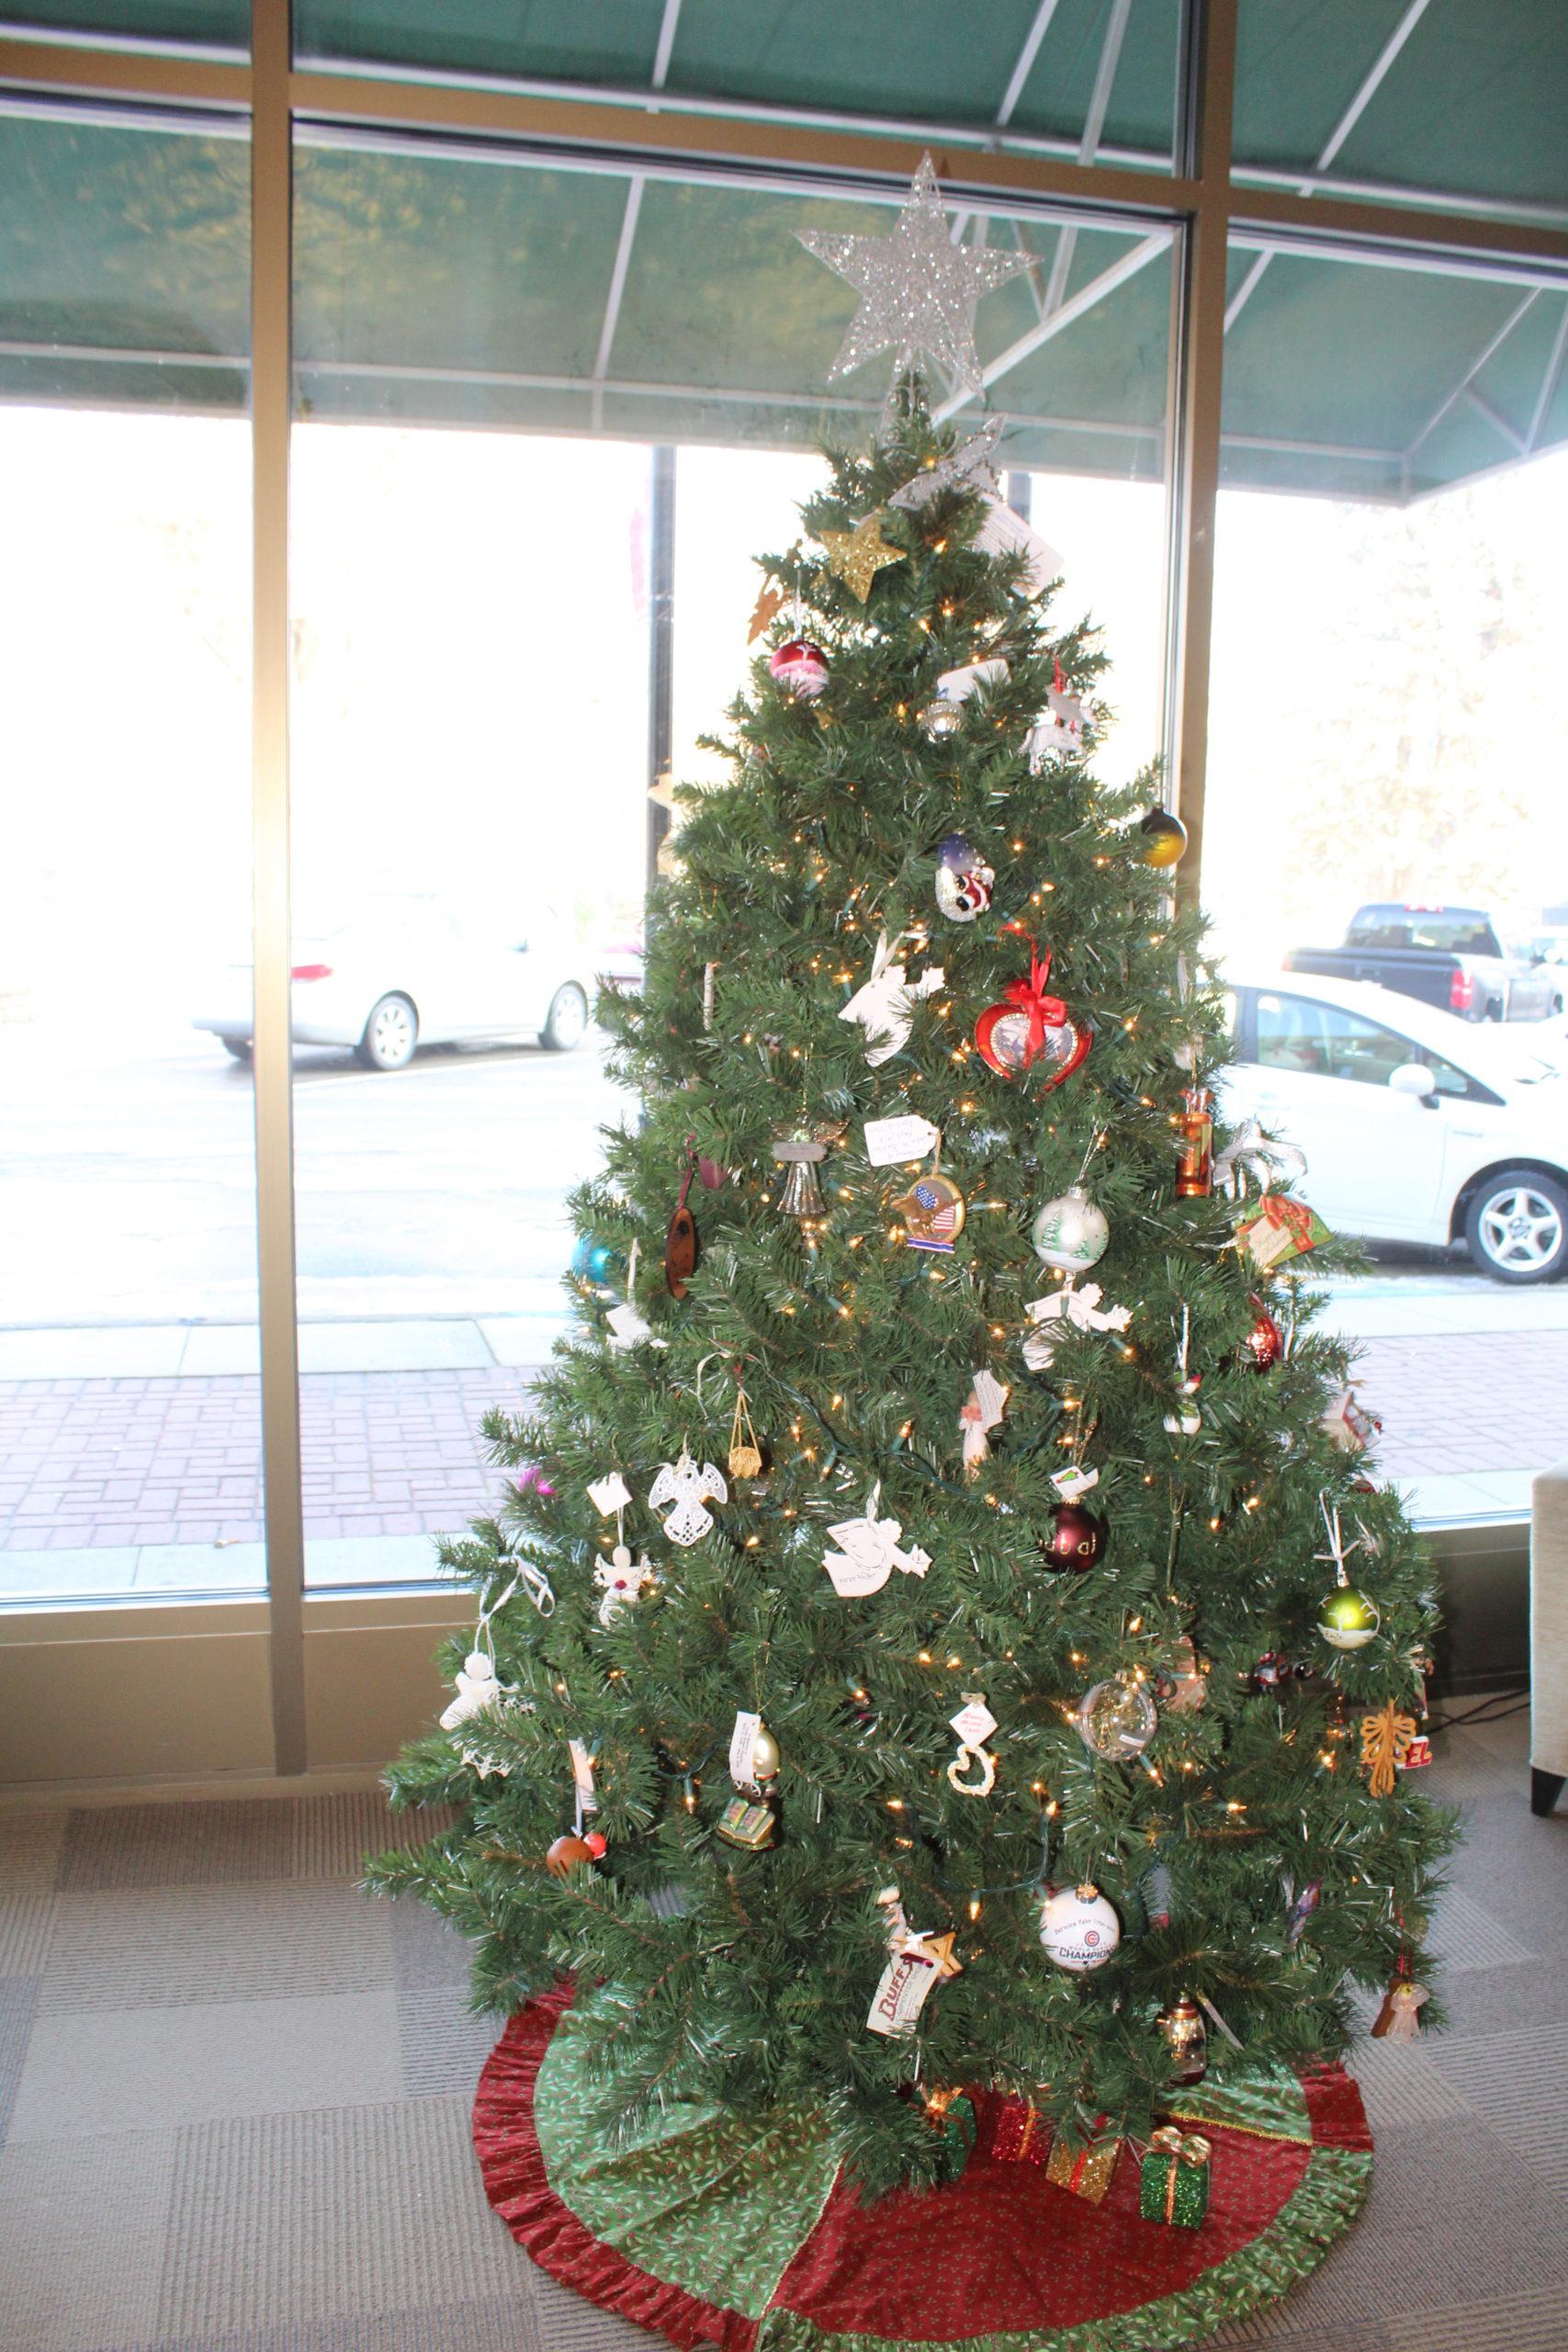 Community Memorial Trees Presented By Hospice Of Washington County   City  Of Washington, Iowa with regard to Hospice Week 2020